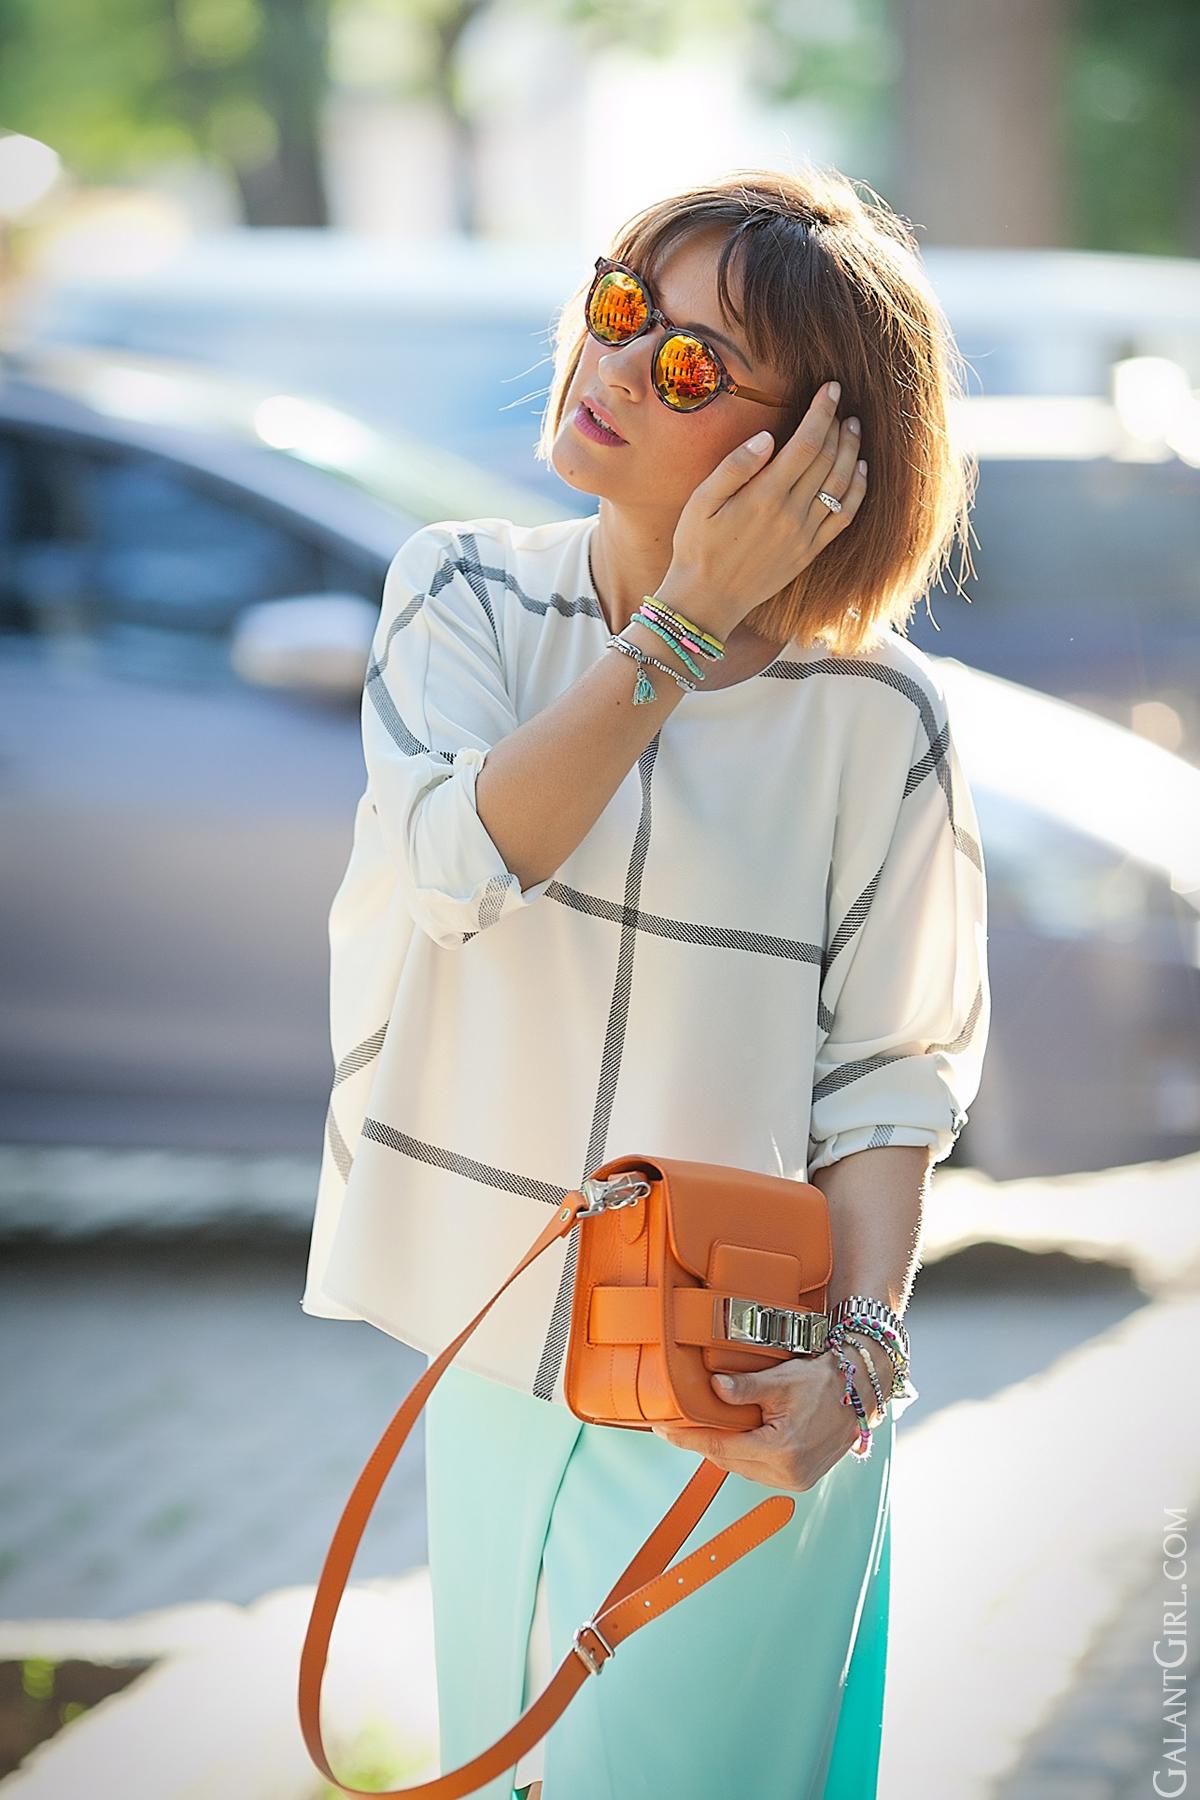 mint-pencil-skirt-orange-proenza-schouler-ps11-galantgirl-streetstyleblog6